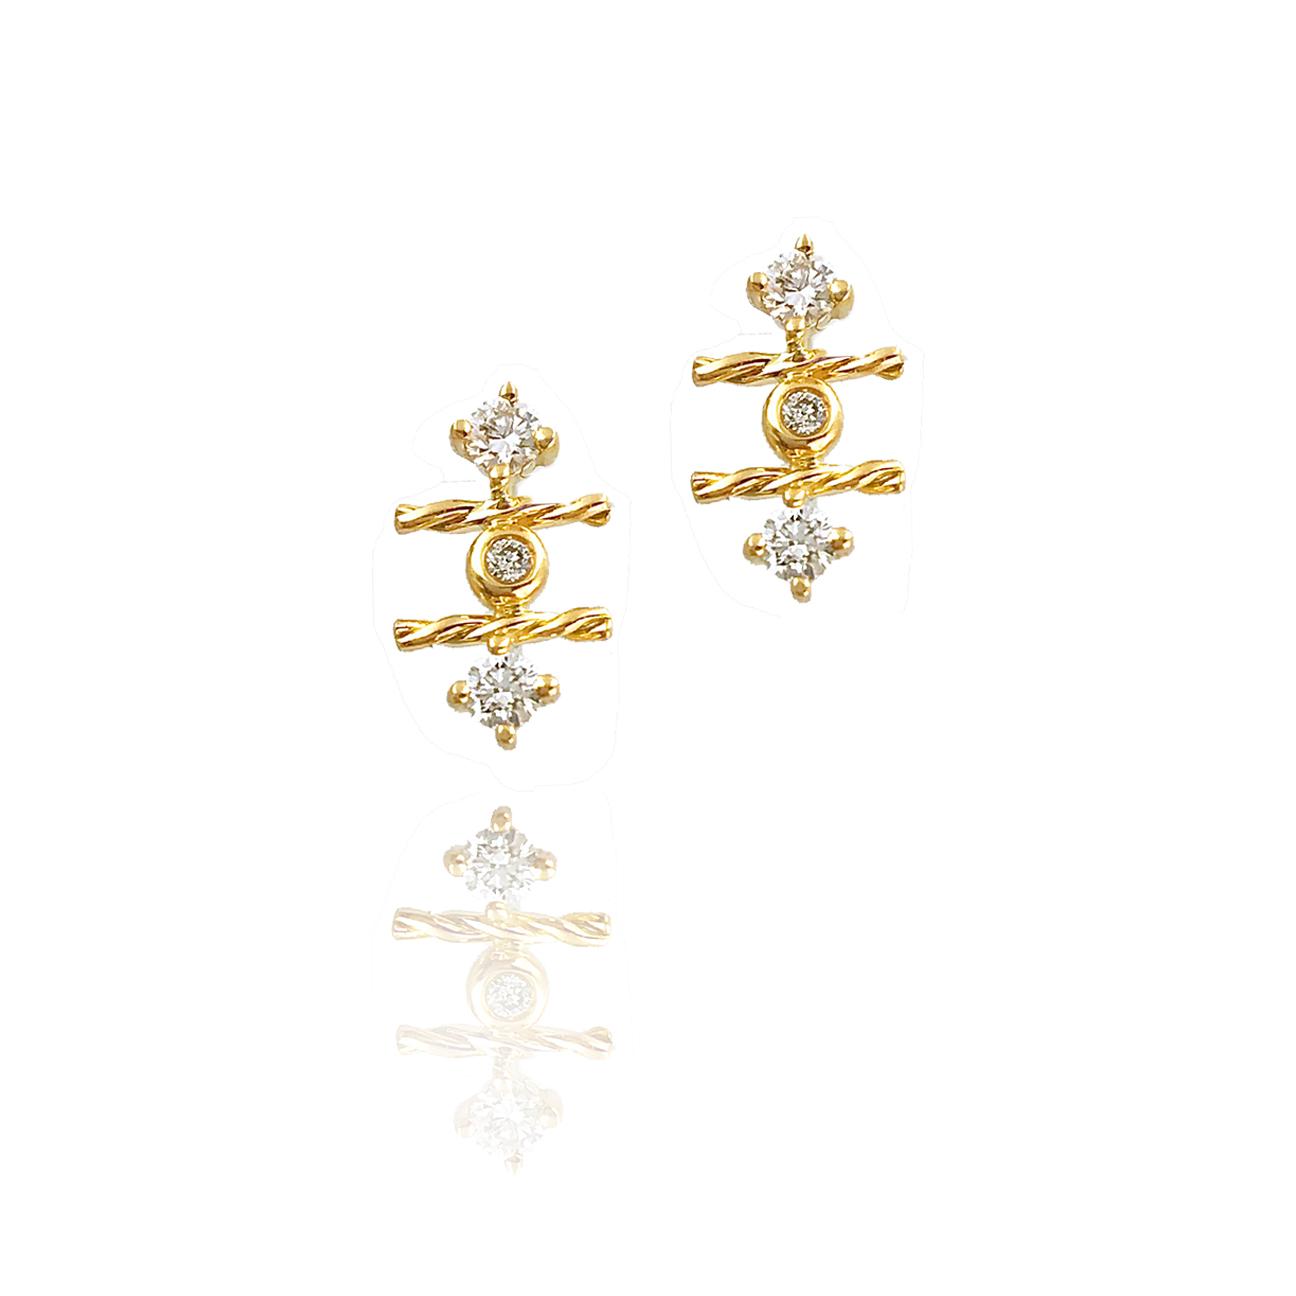 18k-gold-diamond-mix-setting-signature-twist-Stud-Earrings-jewelyrie-hap.-HAP-E-03